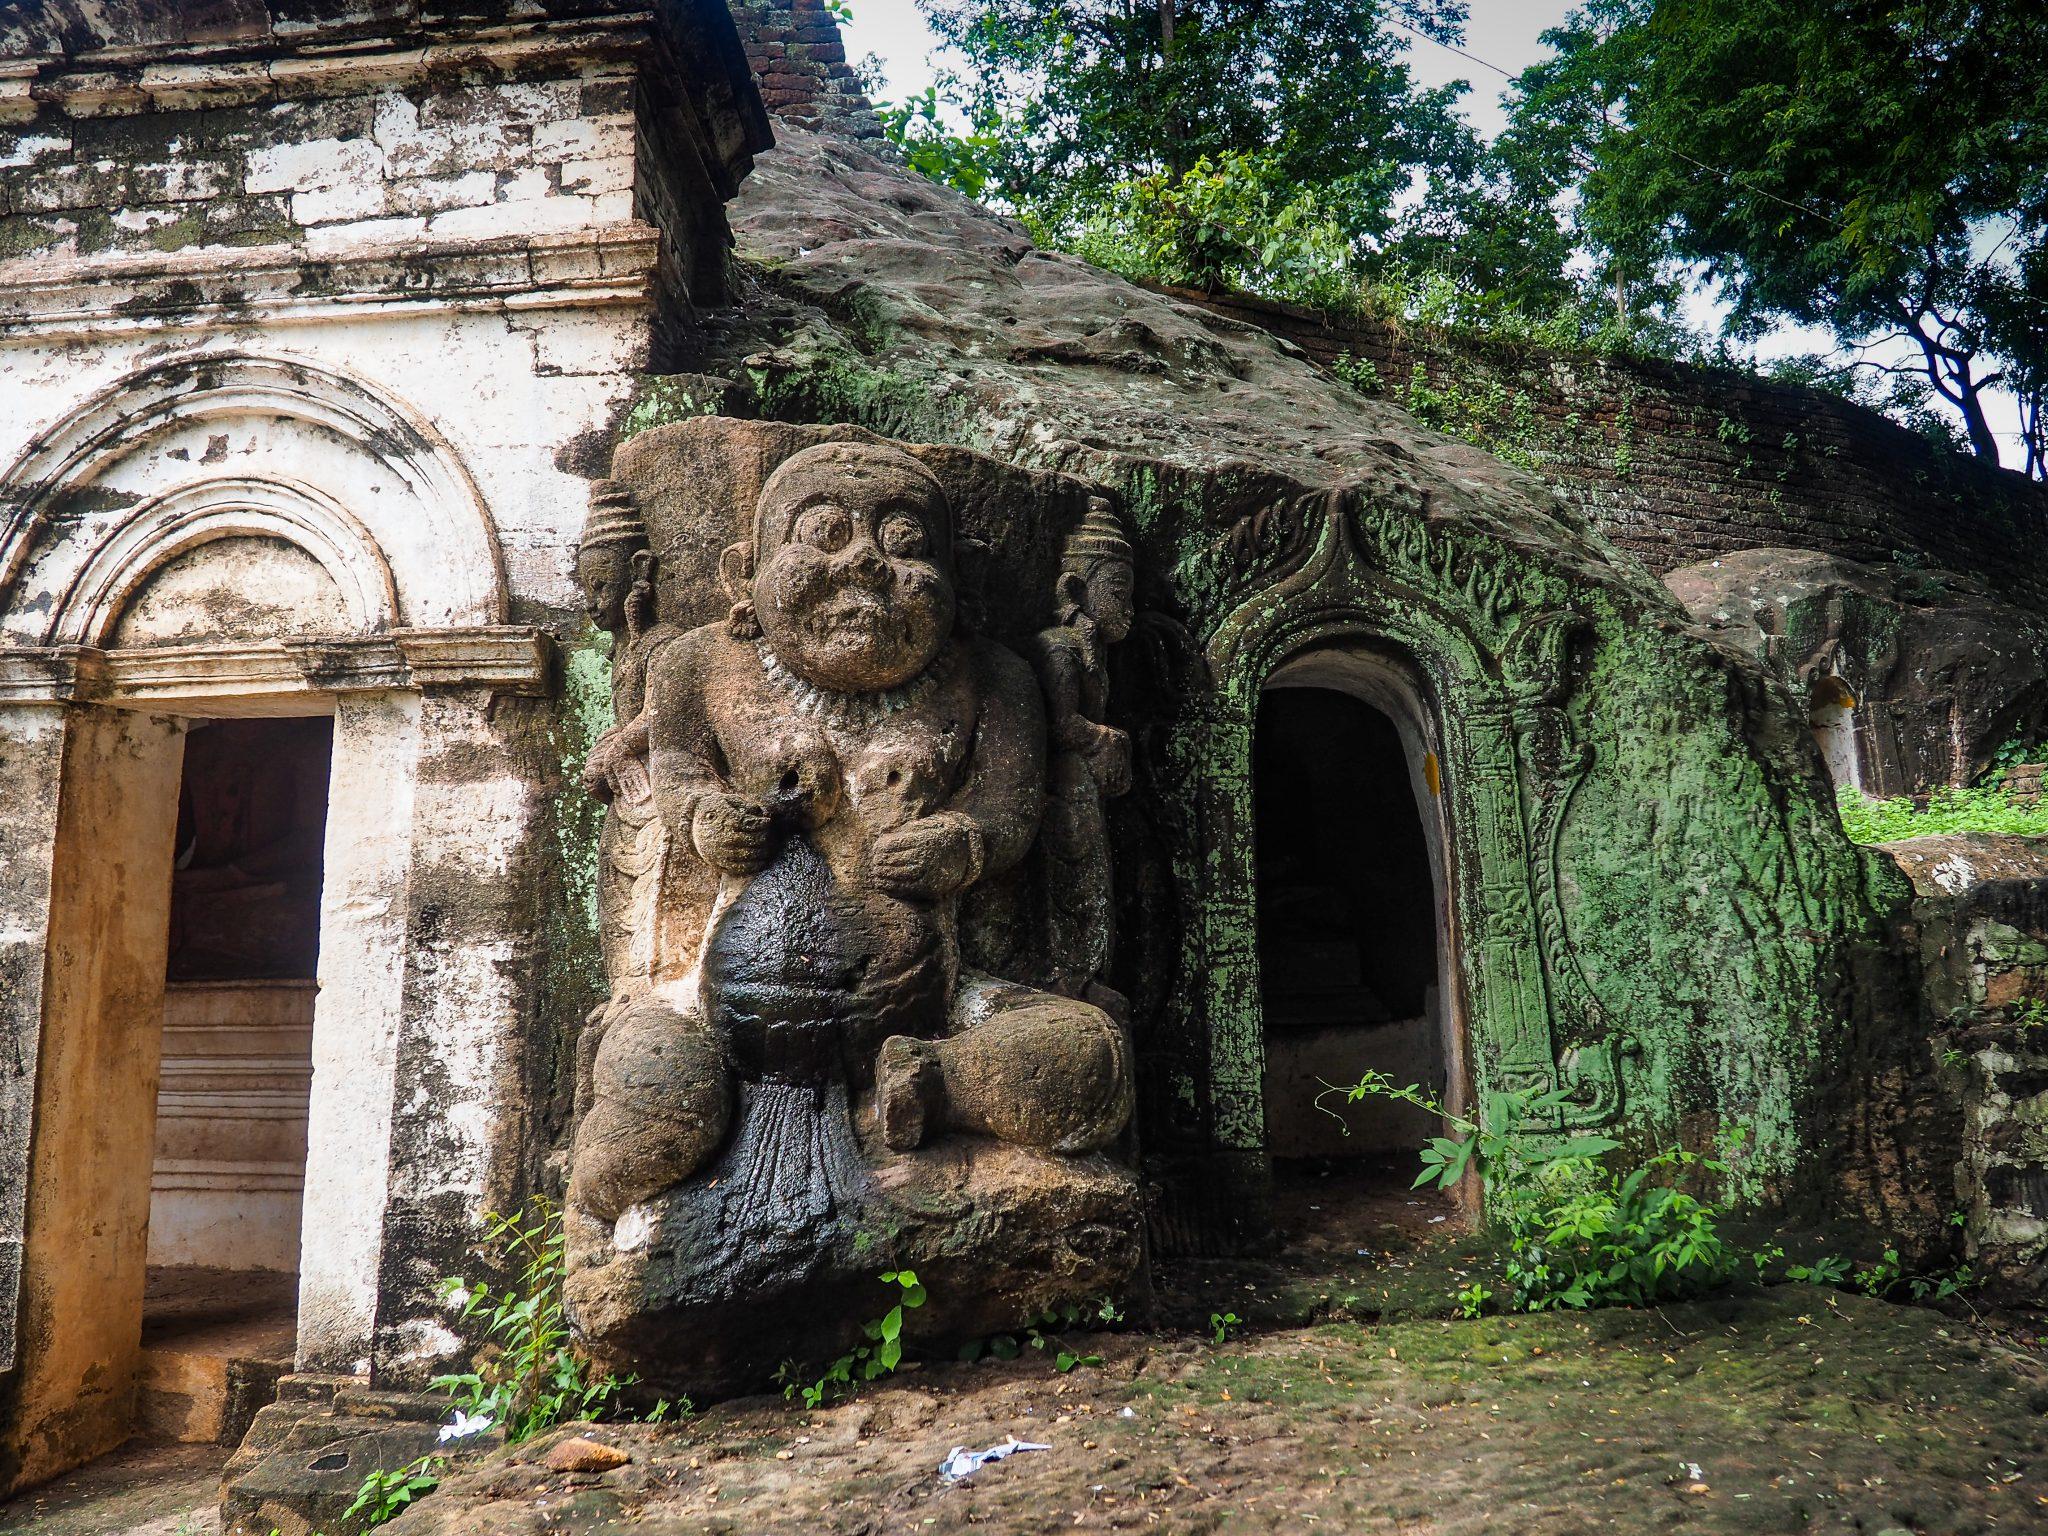 Hpo Win Daung, Templi rupestri, Monywa, Myanmar